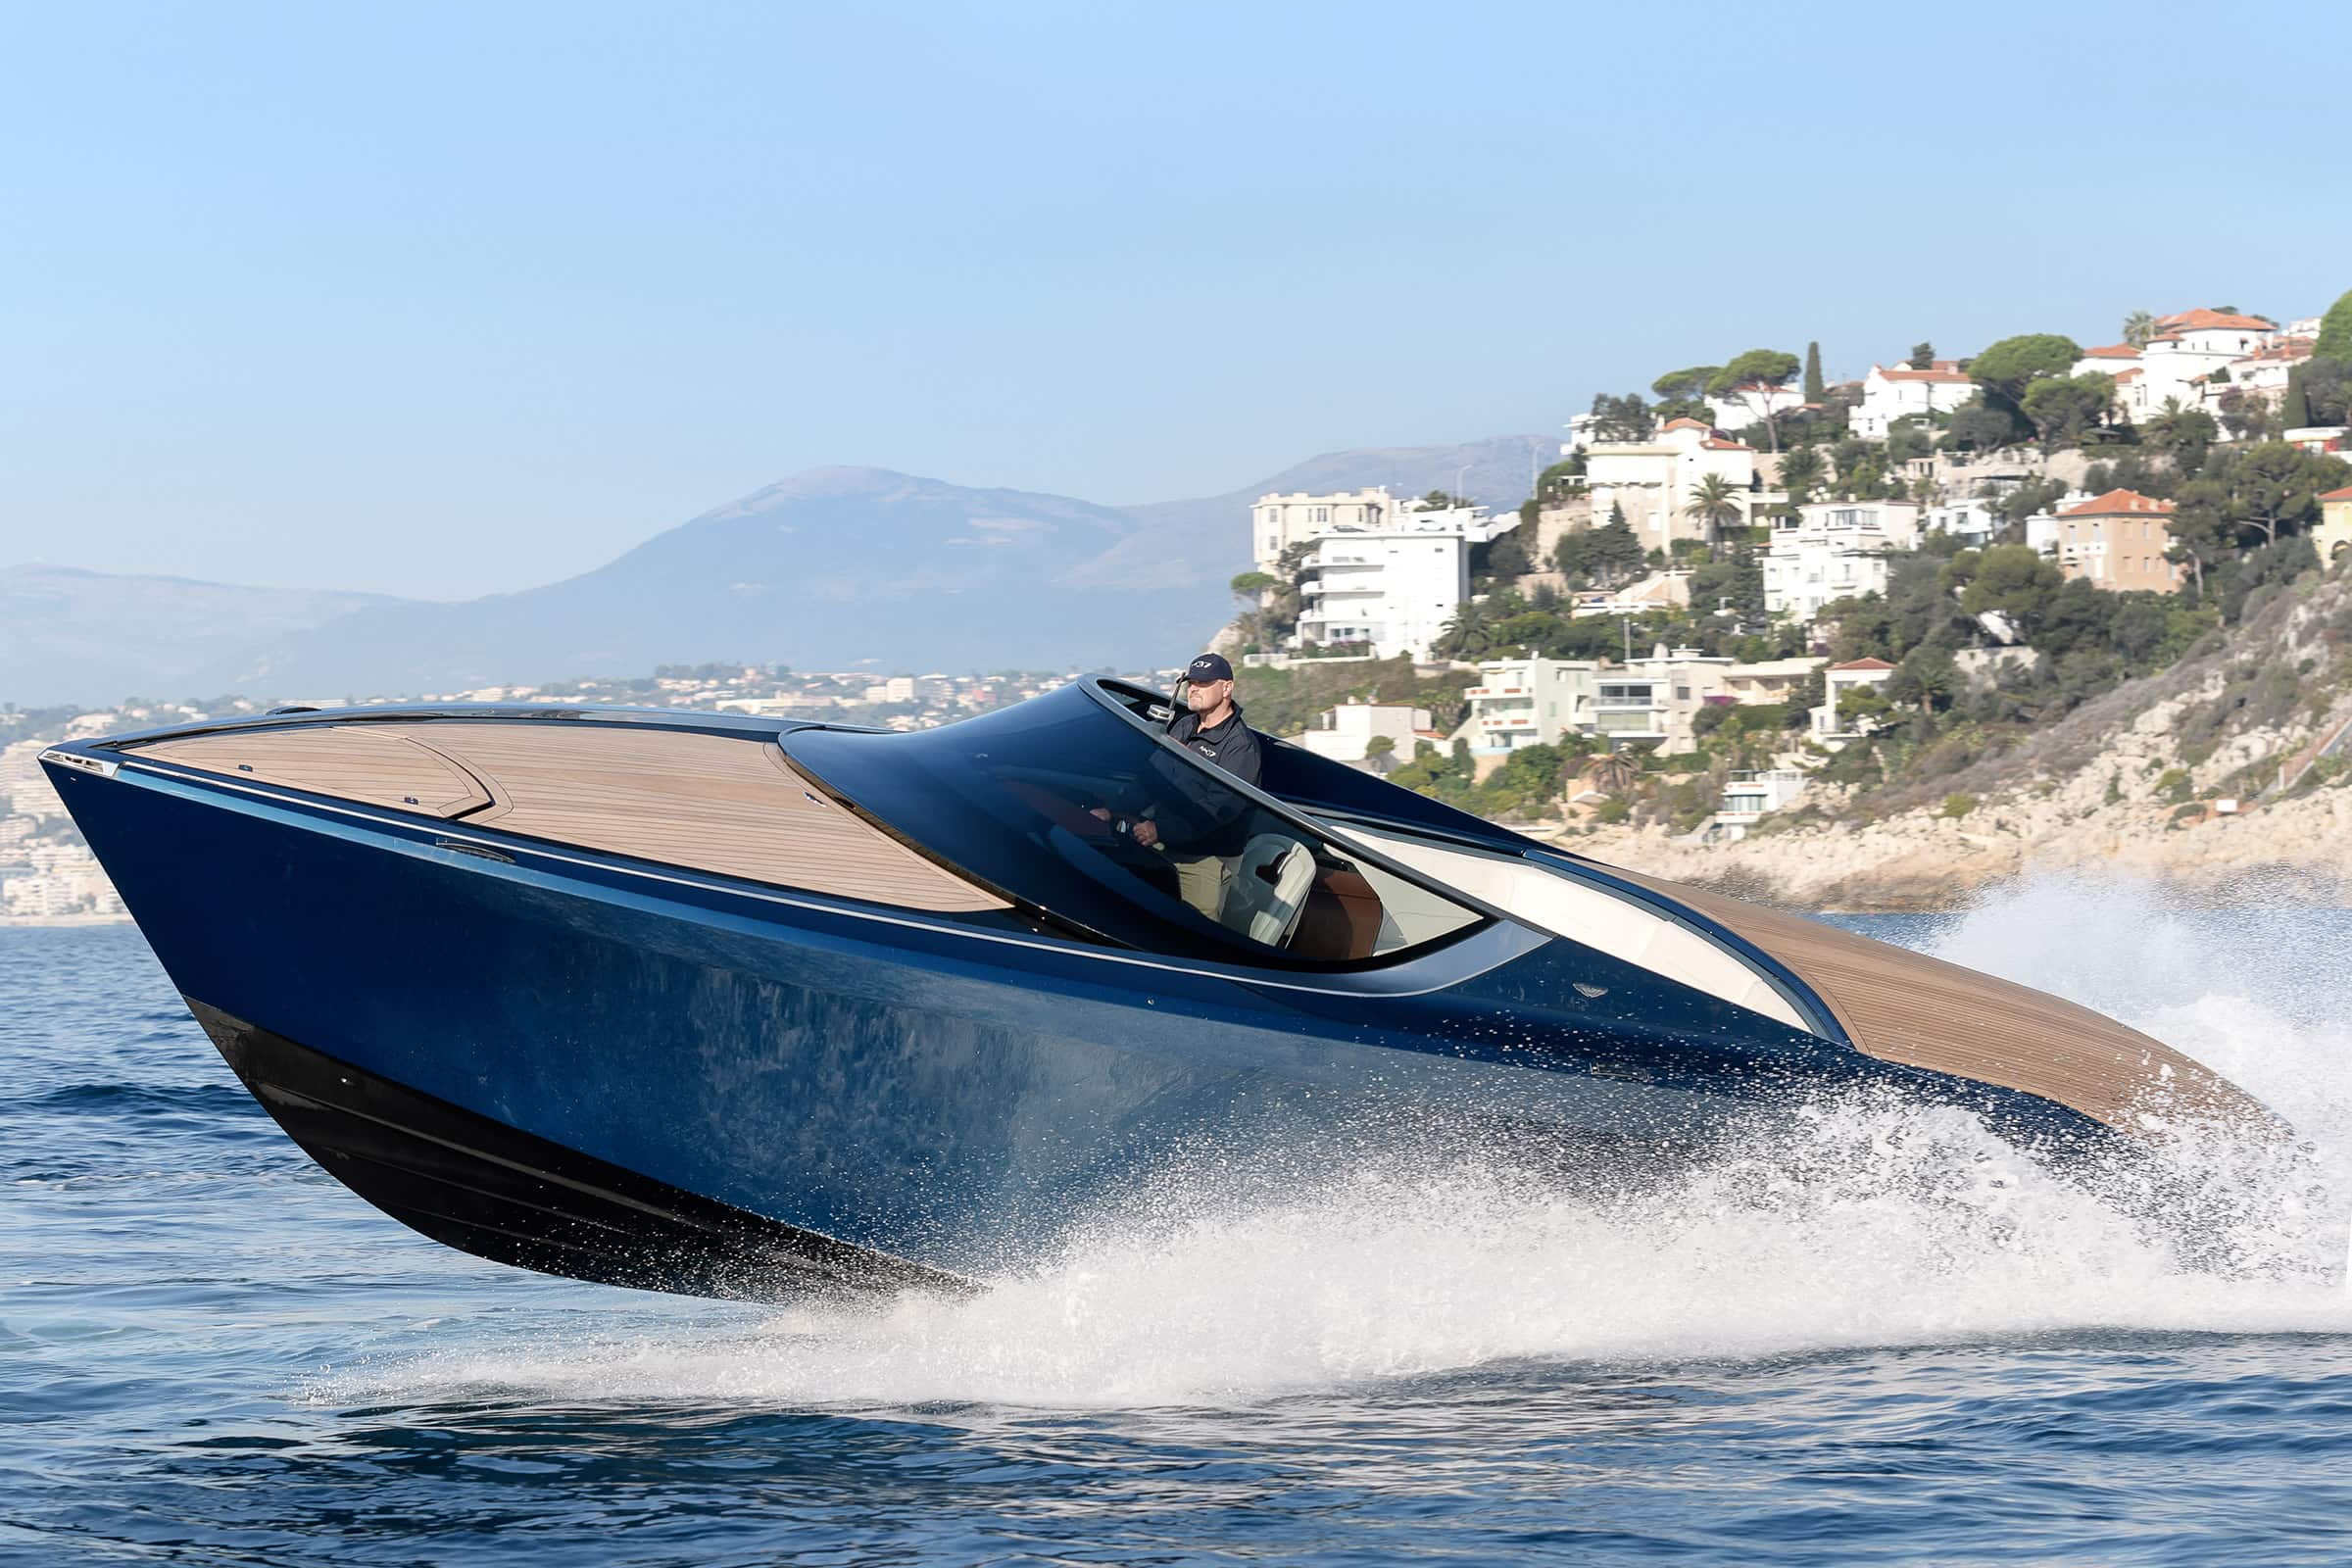 Aston Martin AM37 - Lüks Sürat Teknesi